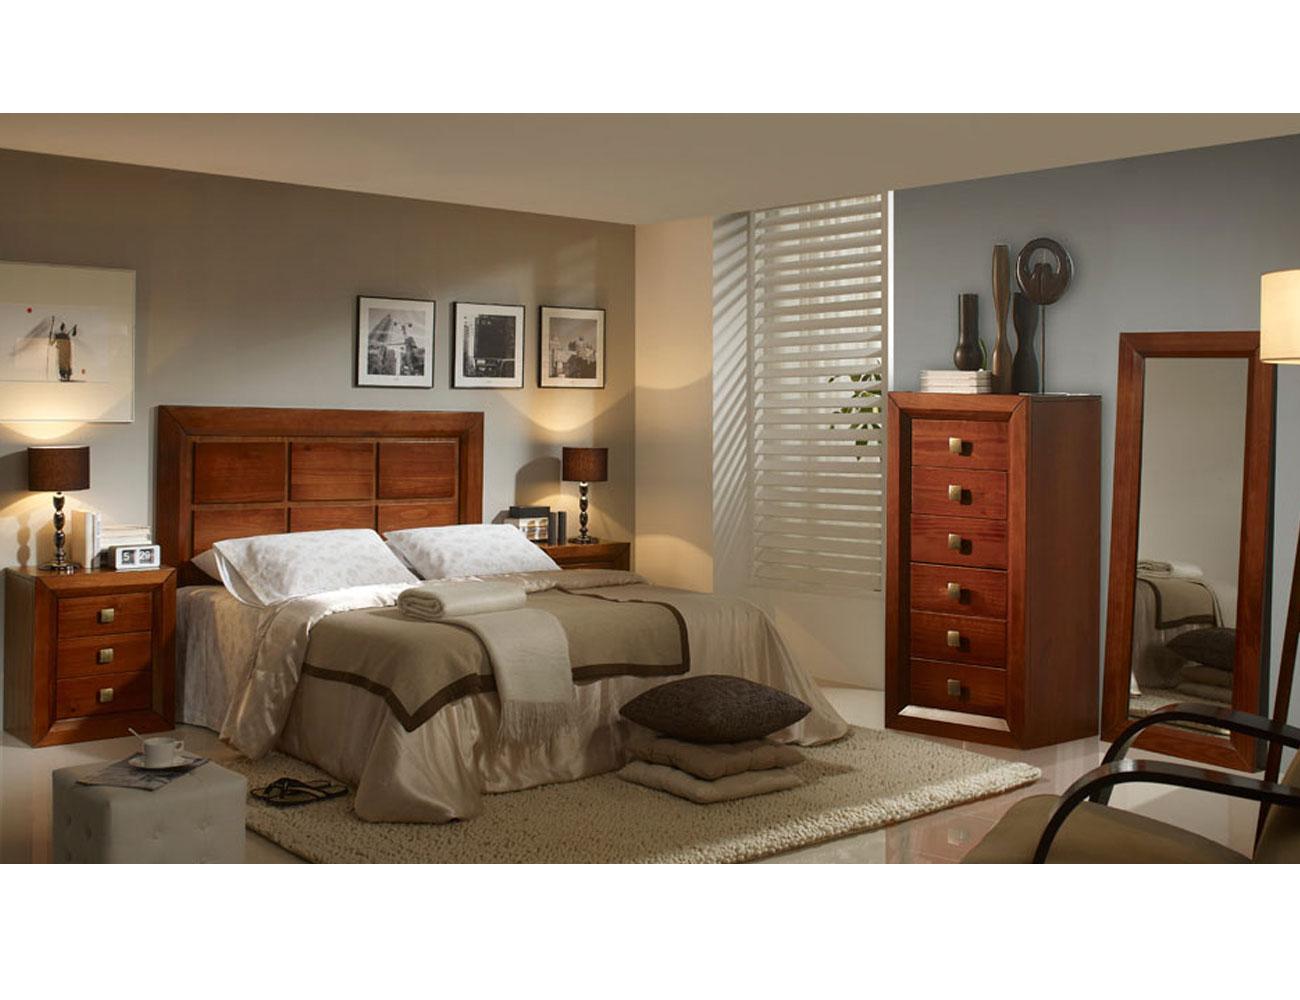 Dormitorio matrimonio sinfonier nogal madera dm2